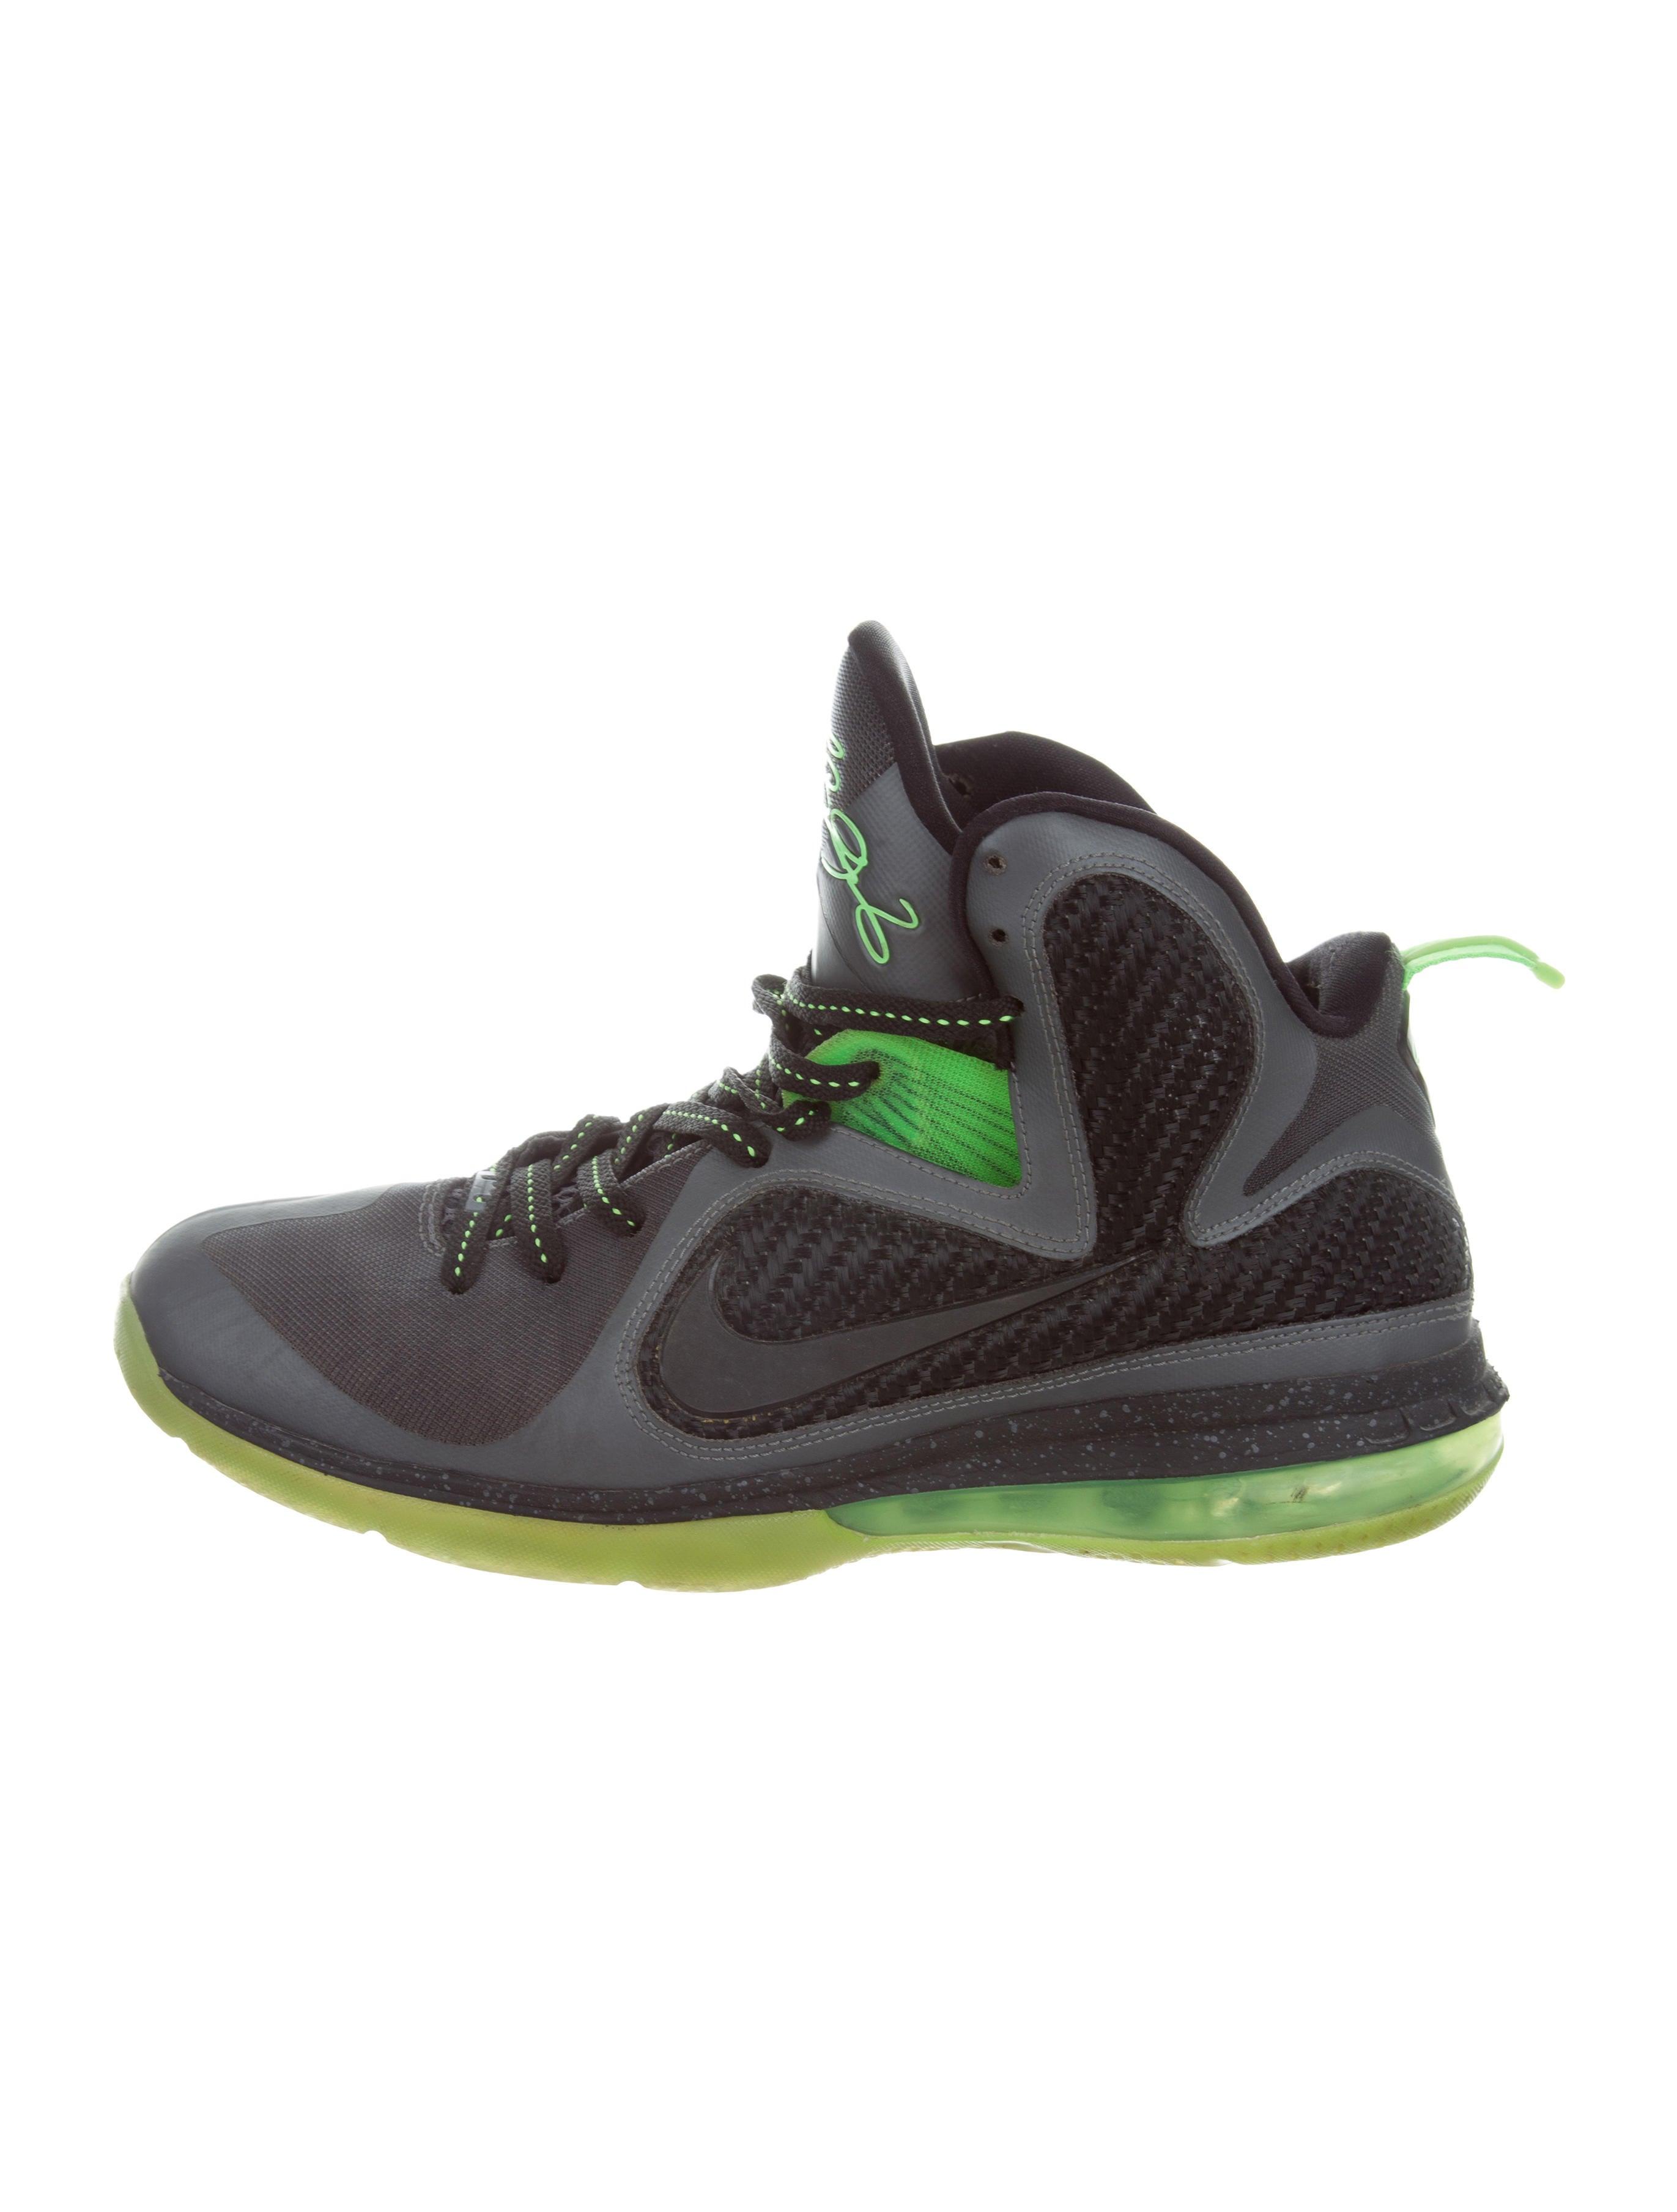 Nike Lebron 9 Dunkman Sneakers - Shoes - WU221623 | The ...